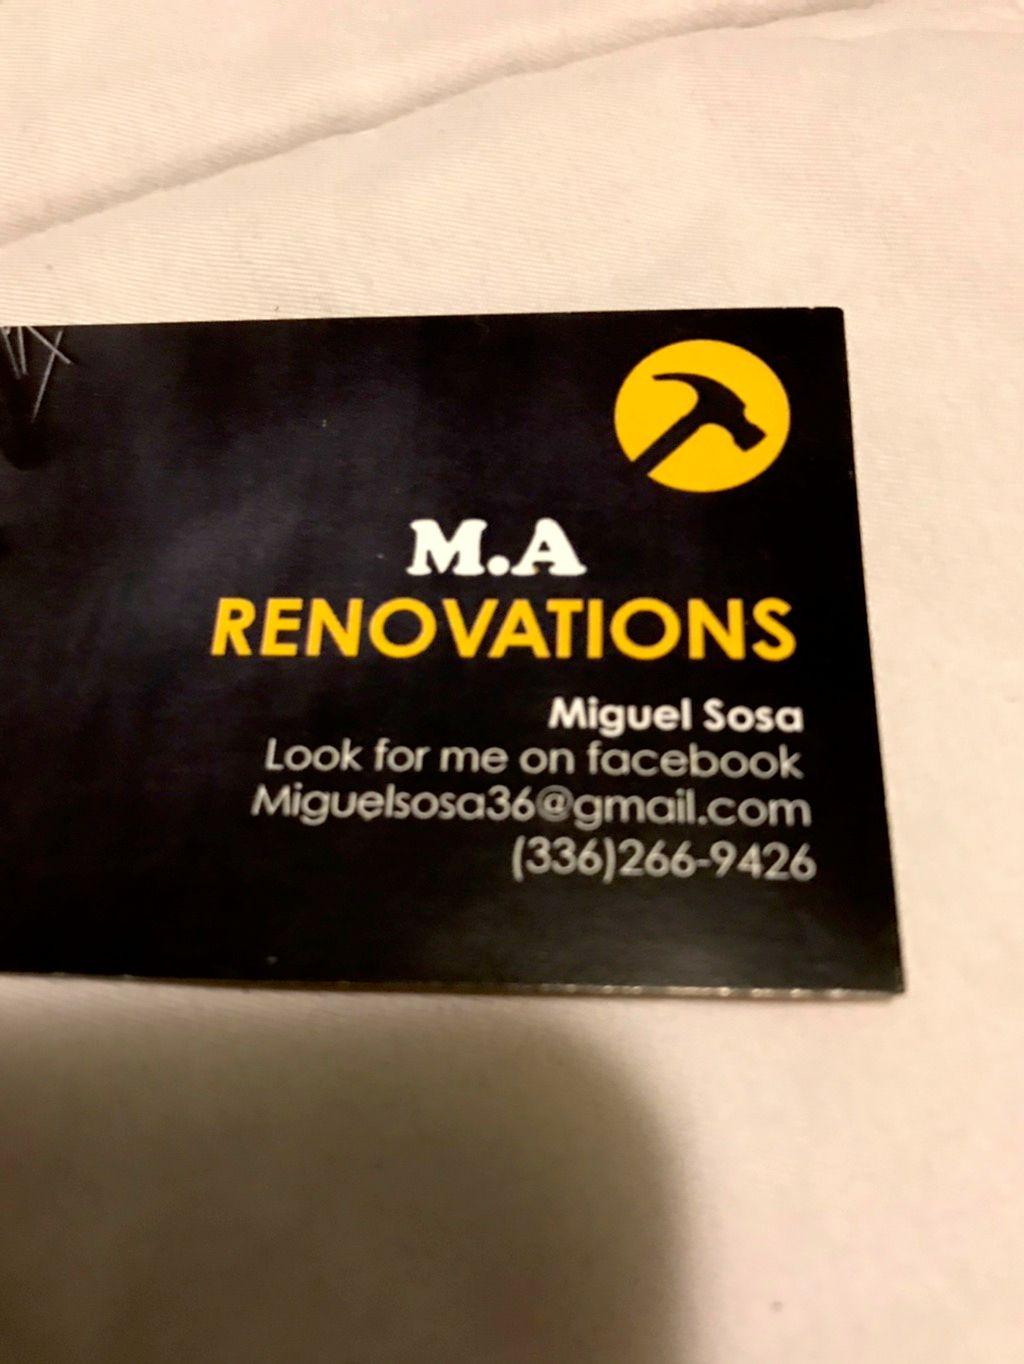 M.A Renovations